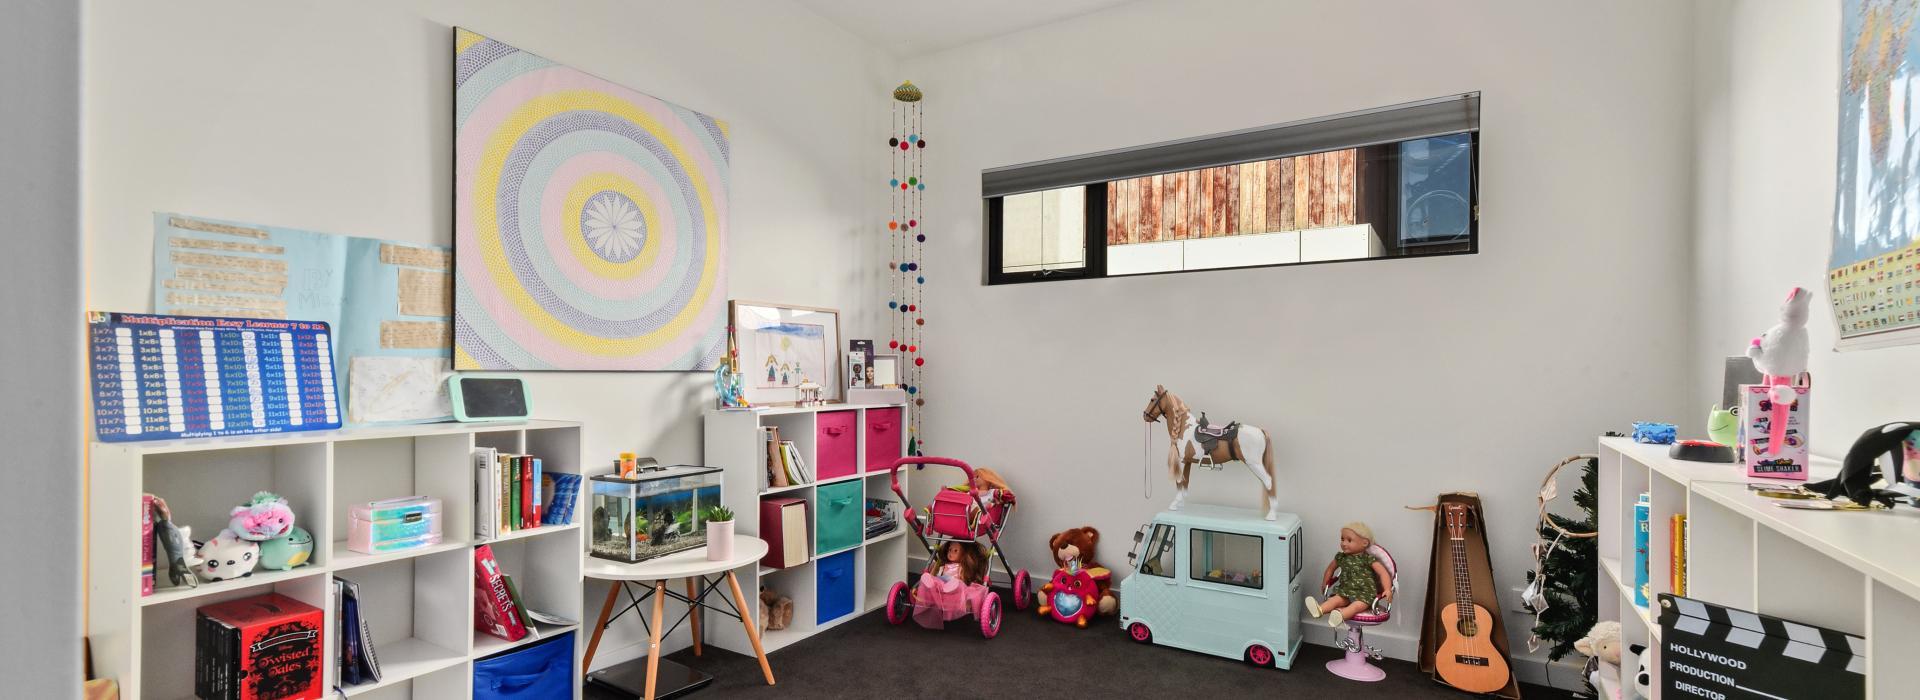 For Sale | Flanagan Residential | South Launceston | Paul Flanagan